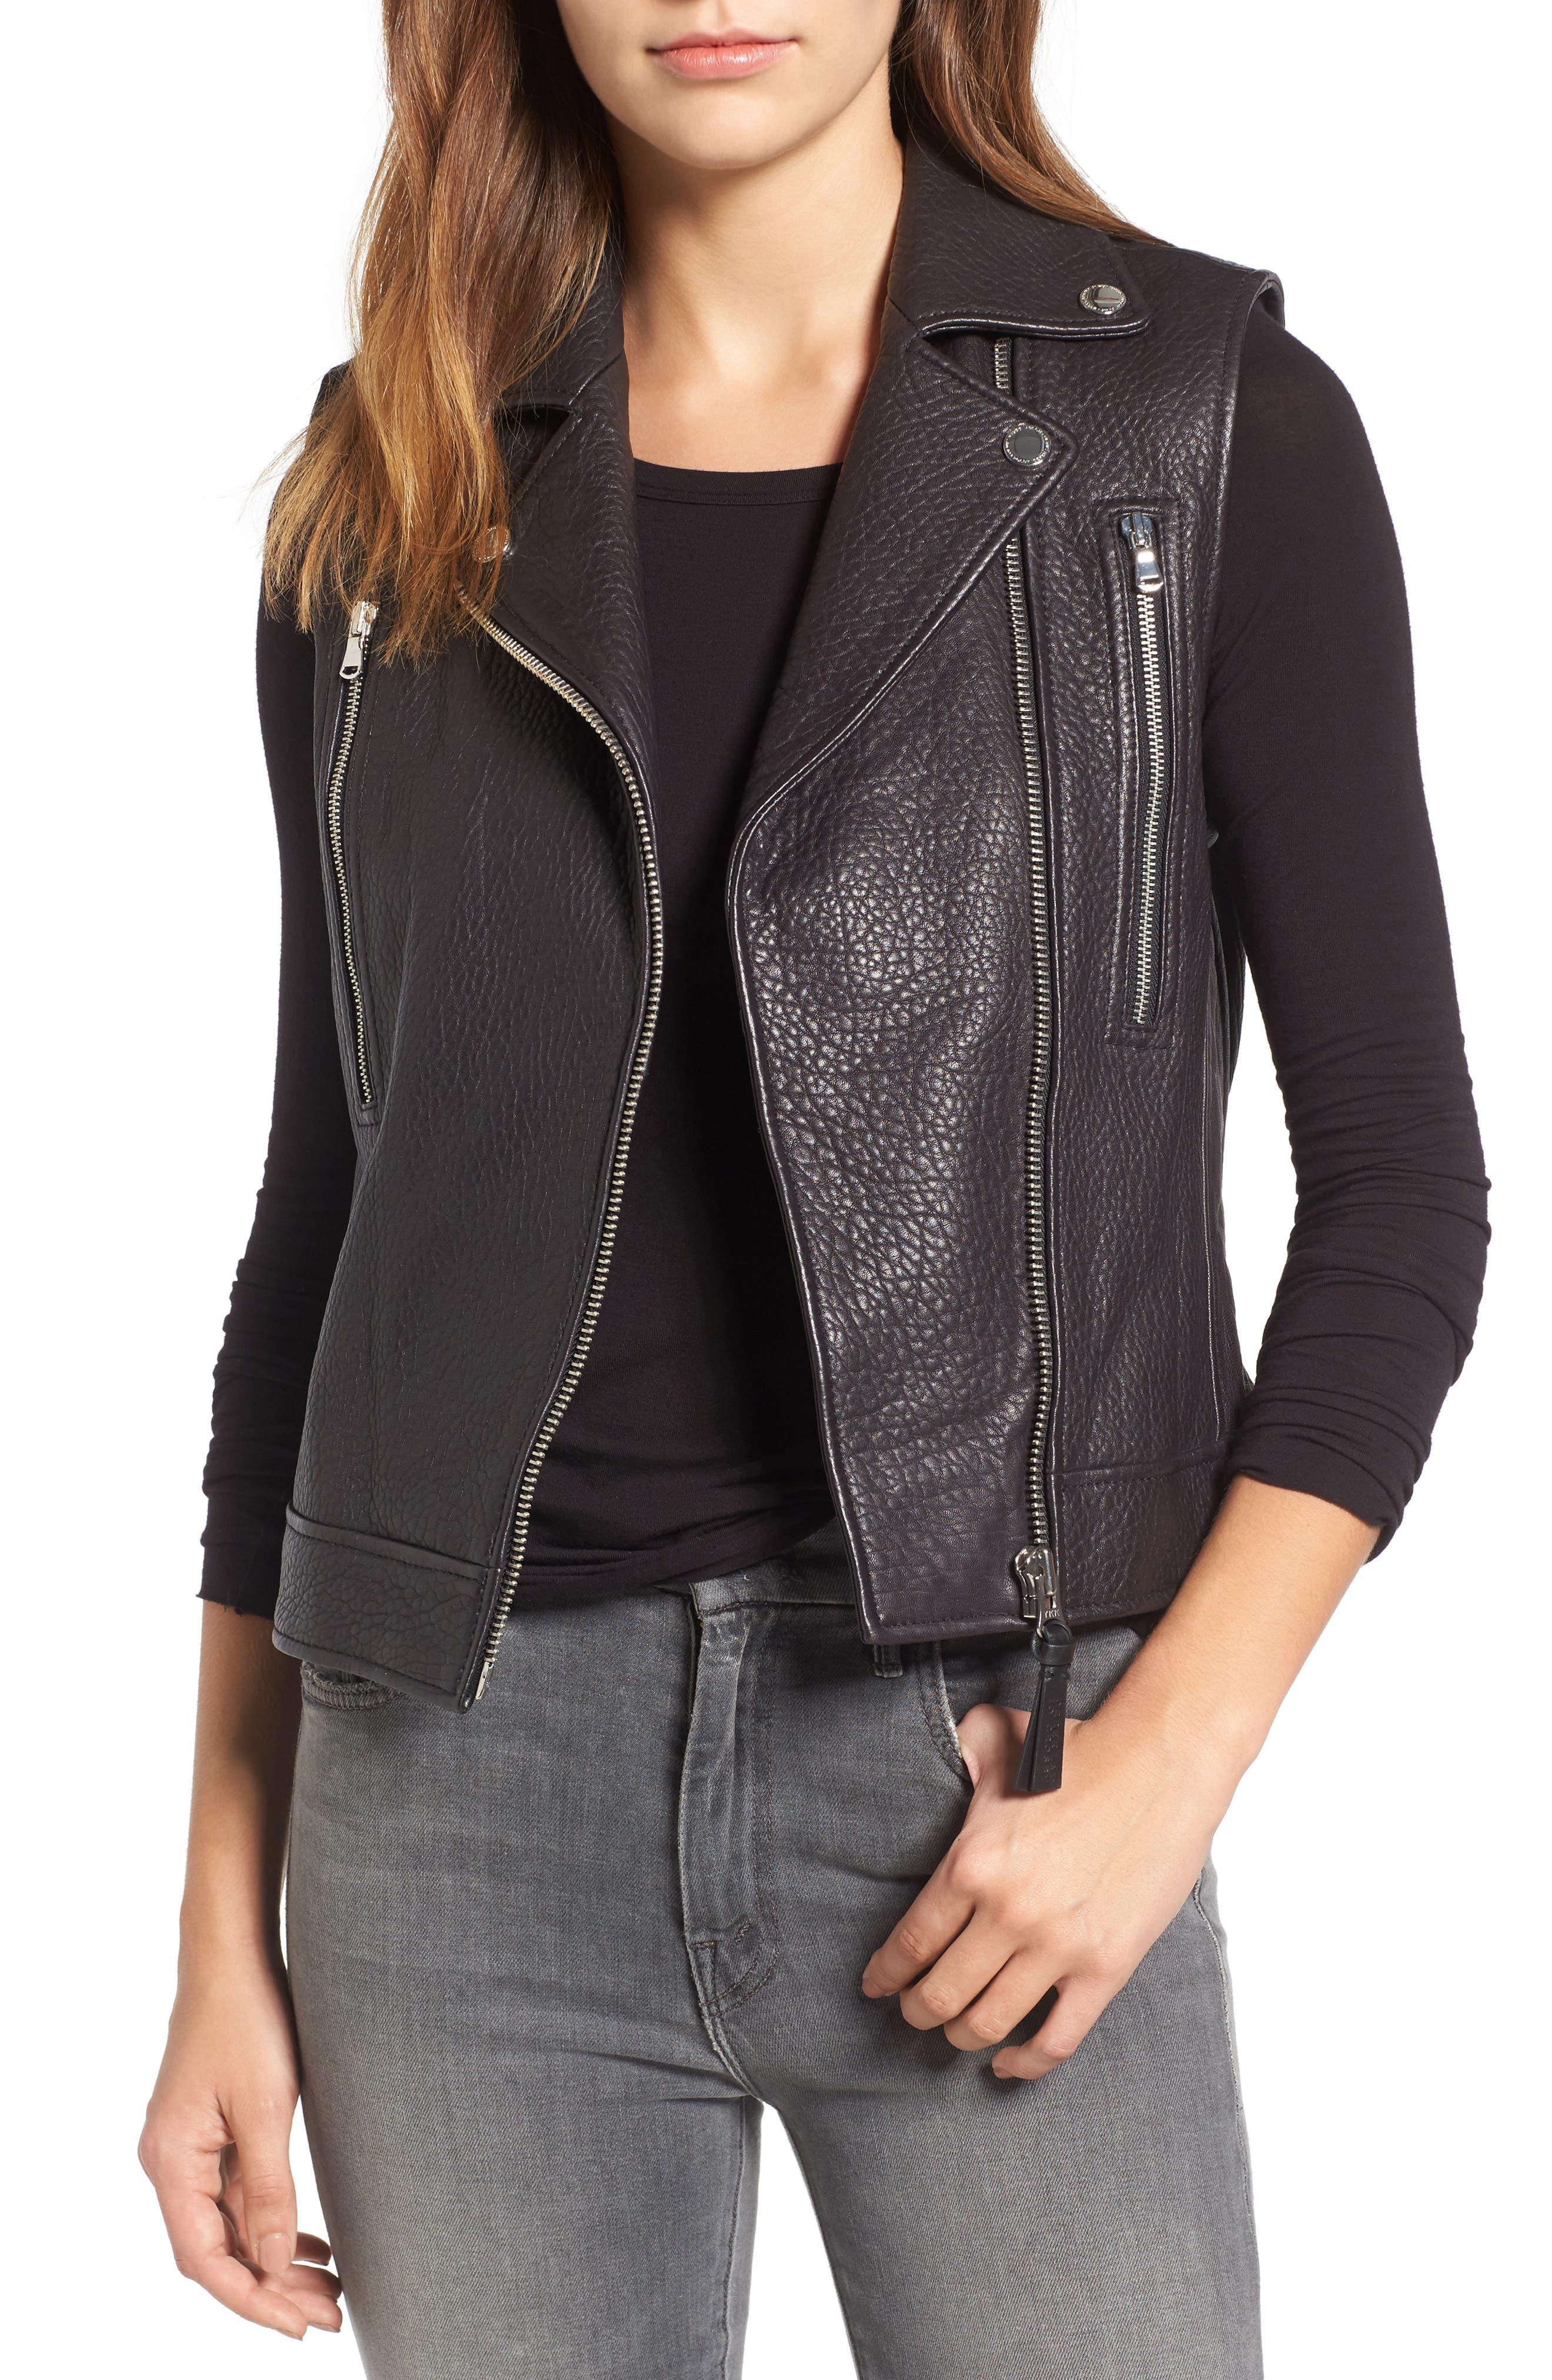 Derek Lam 10 Crosby Leather Moto Vest